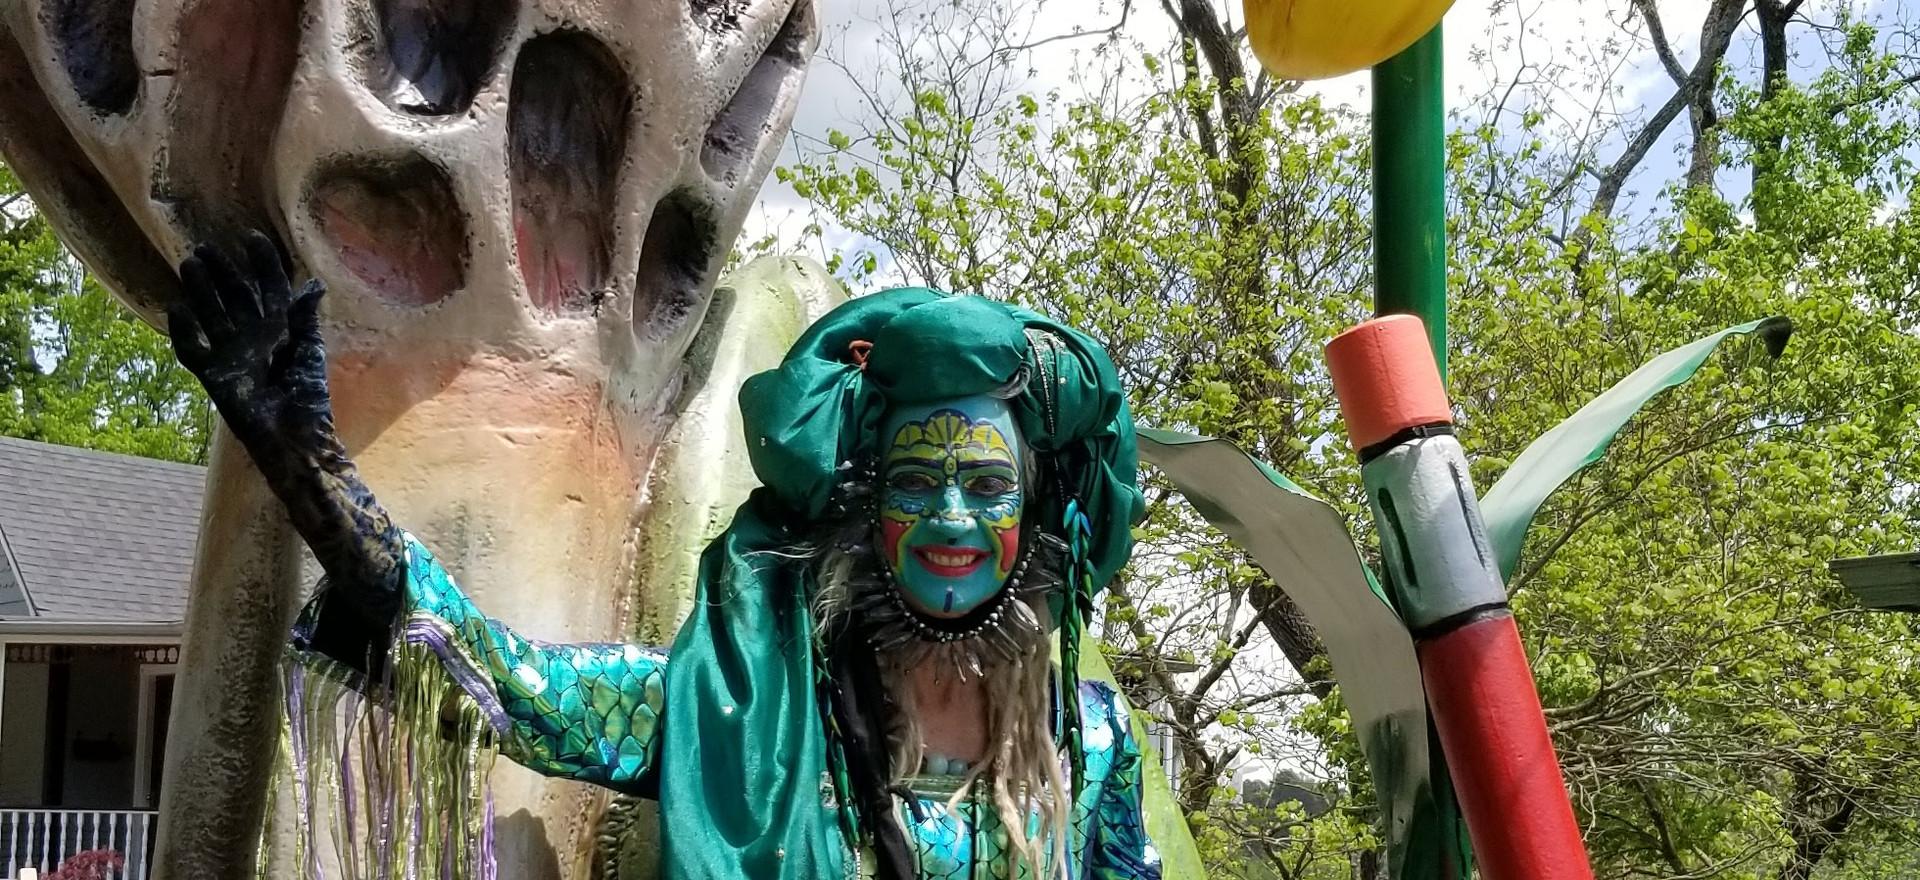 Grand prize Parade Float